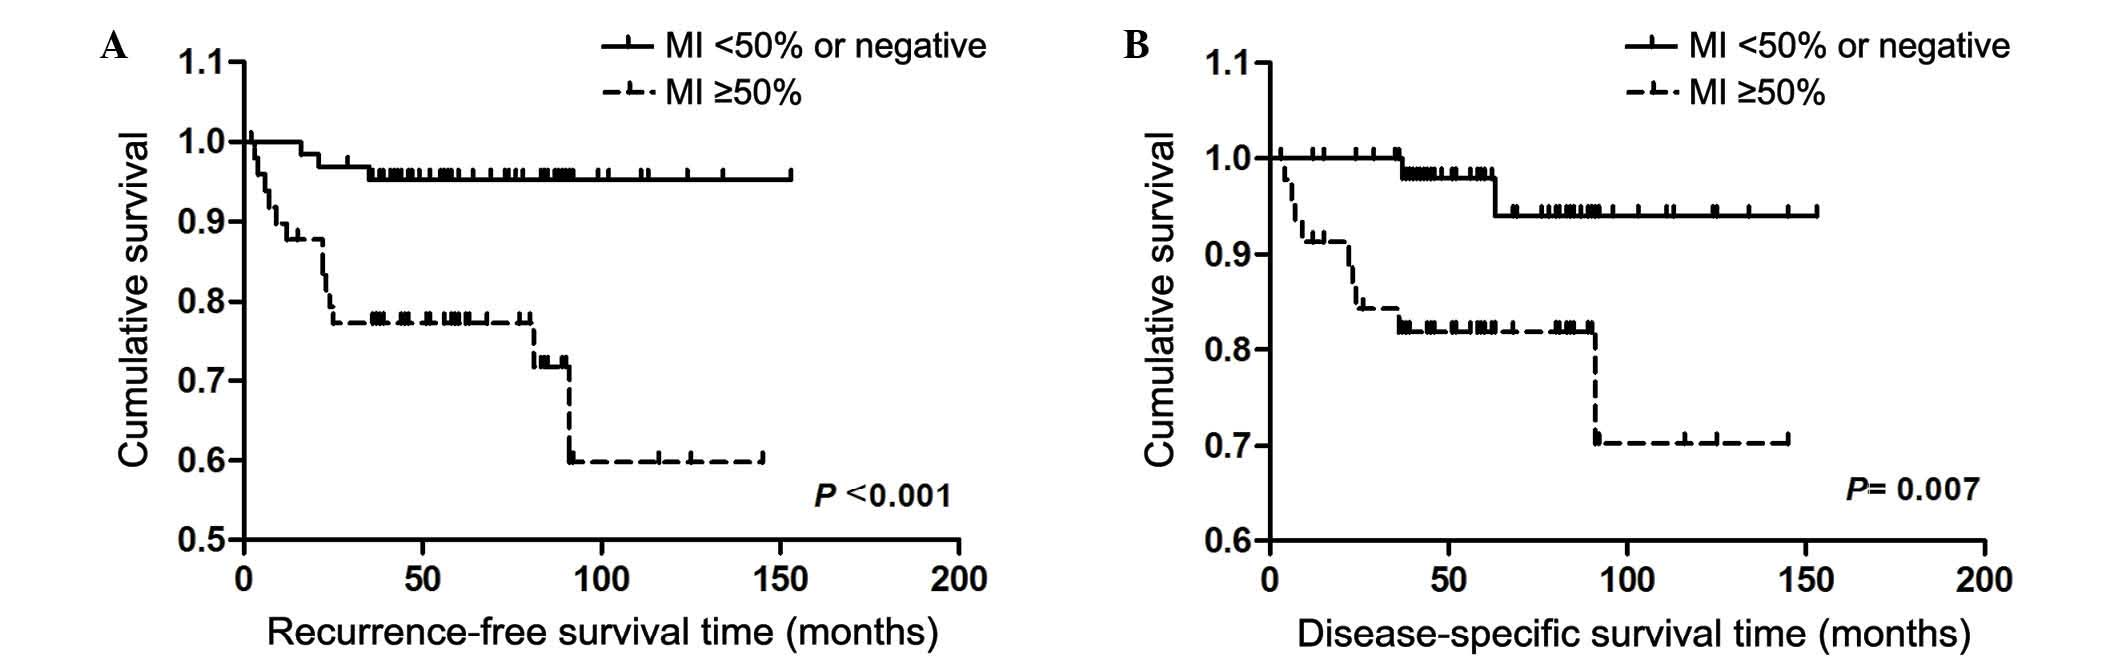 warts urine treatment papilloma virus zone